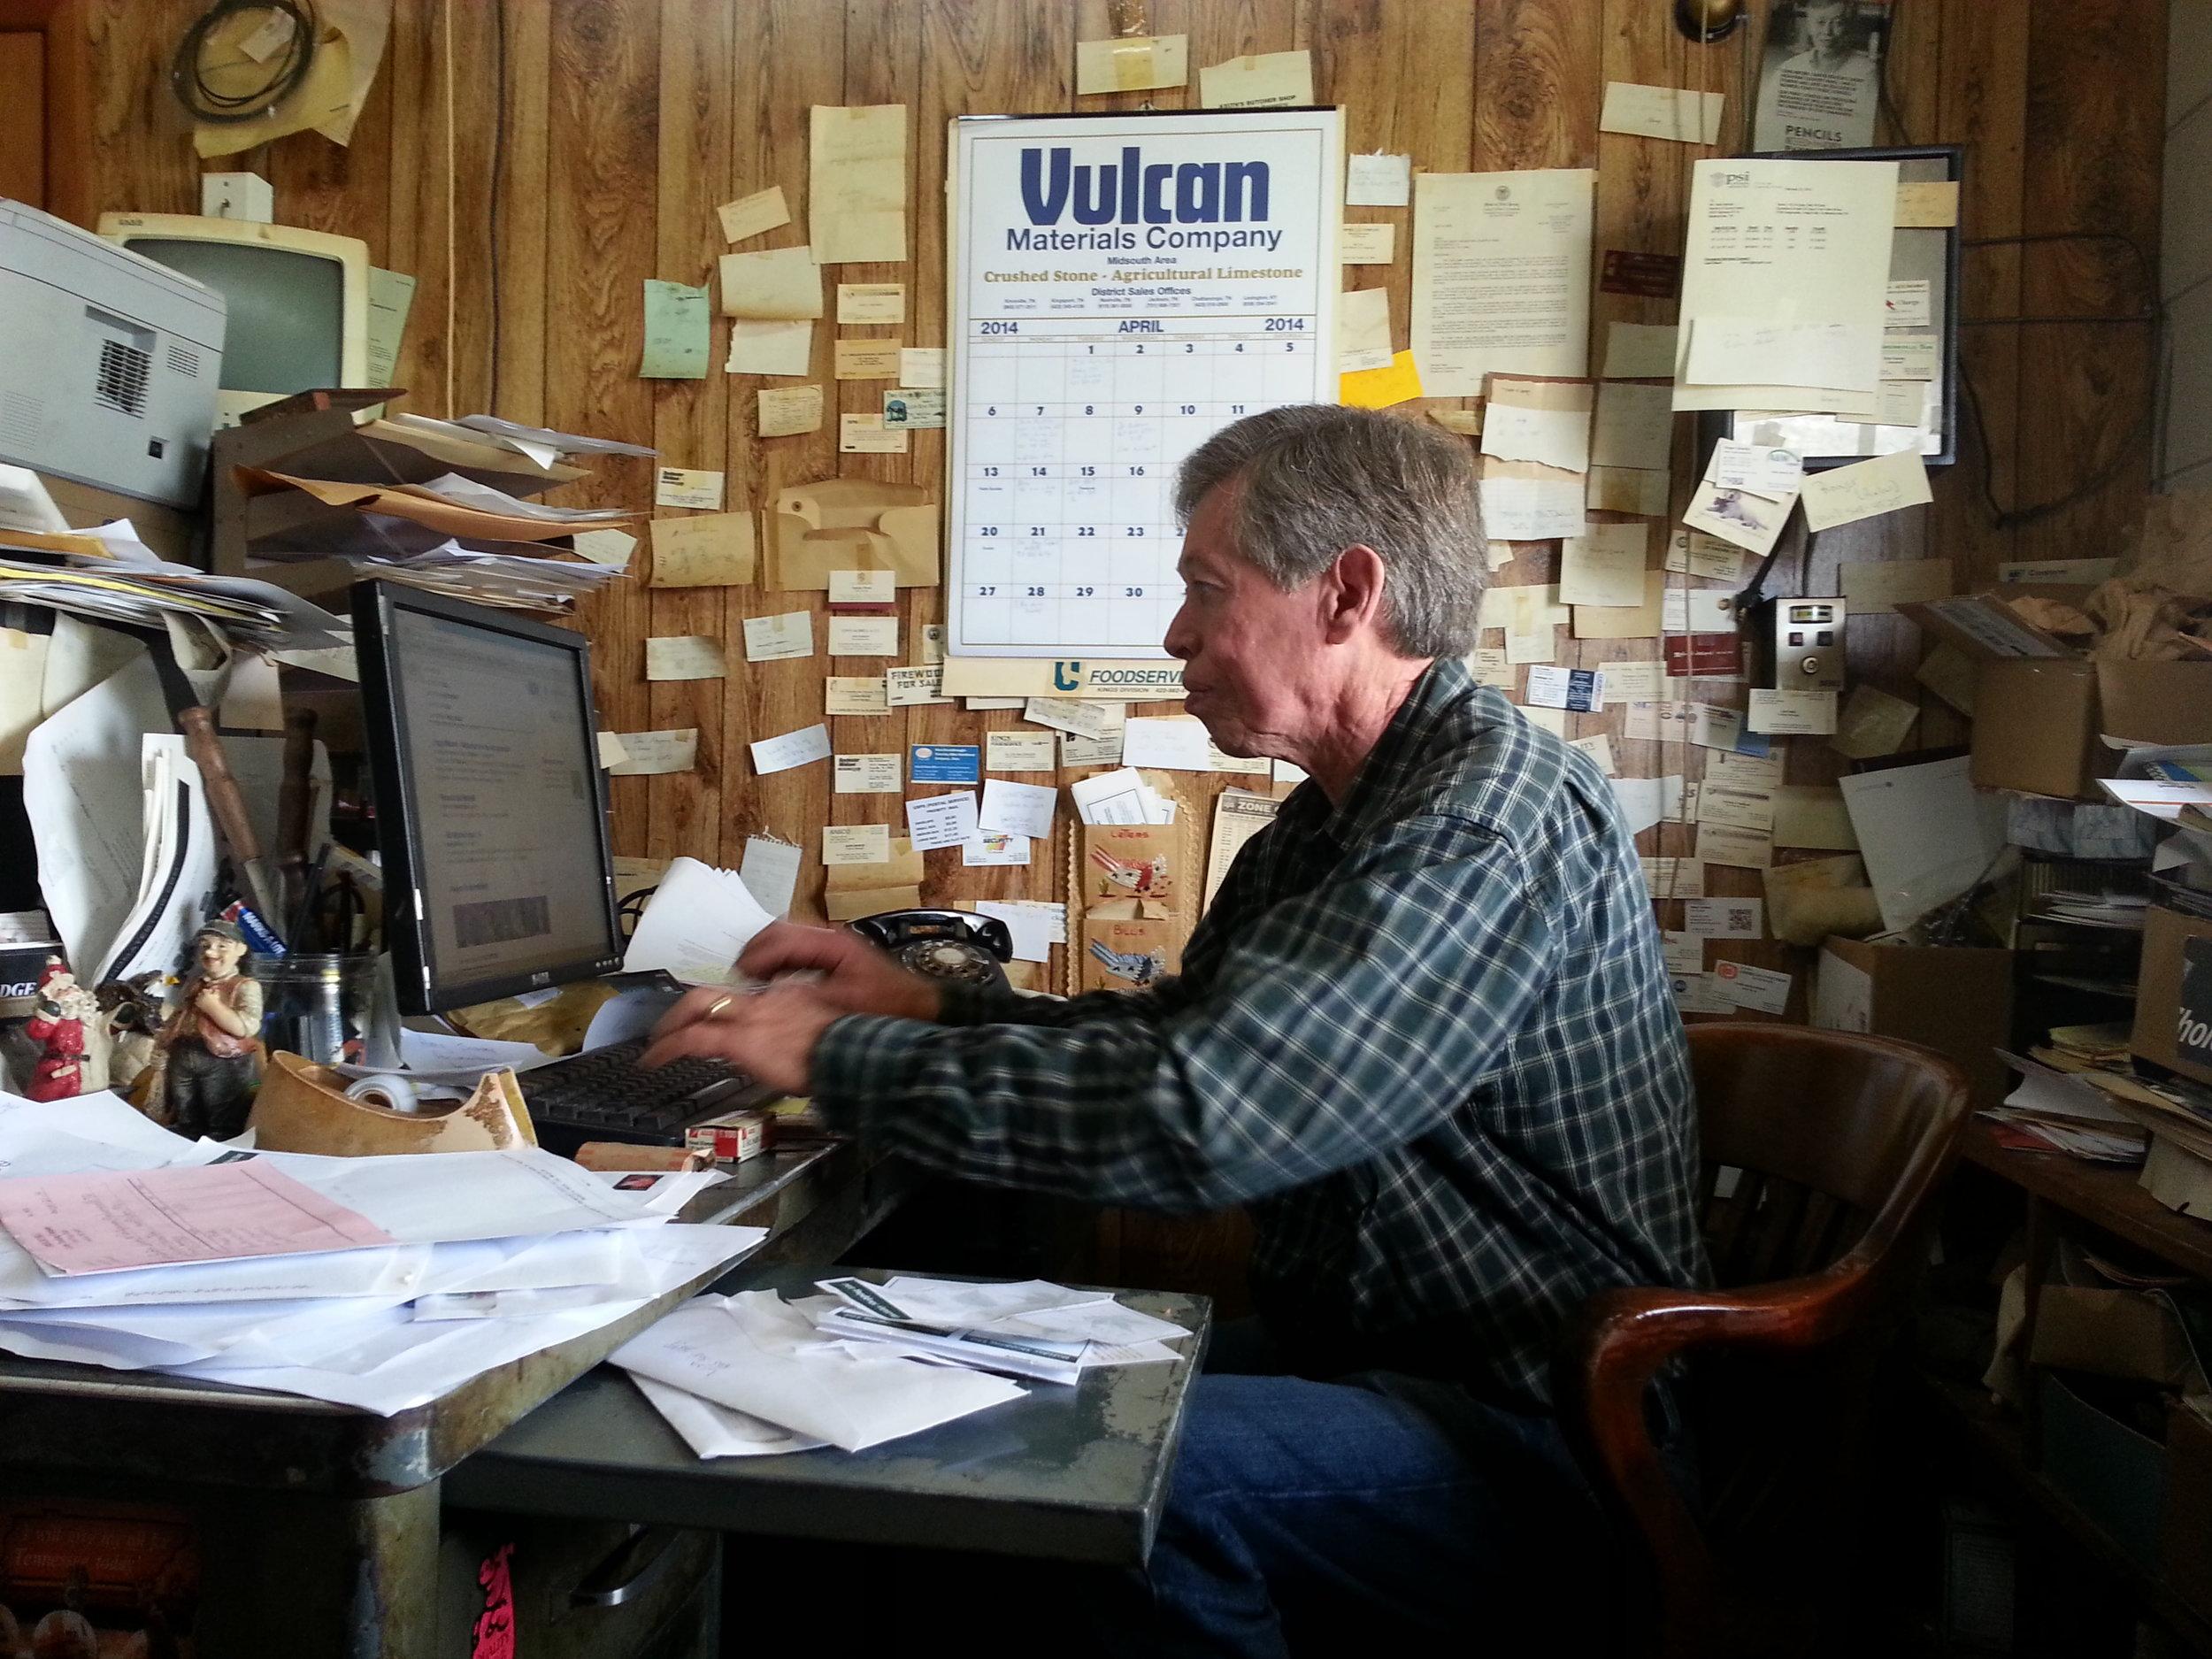 Allan Benton at his desk, Madisonville, TN. Photo: Amy Campbell. https://bentonscountryhams2.com/